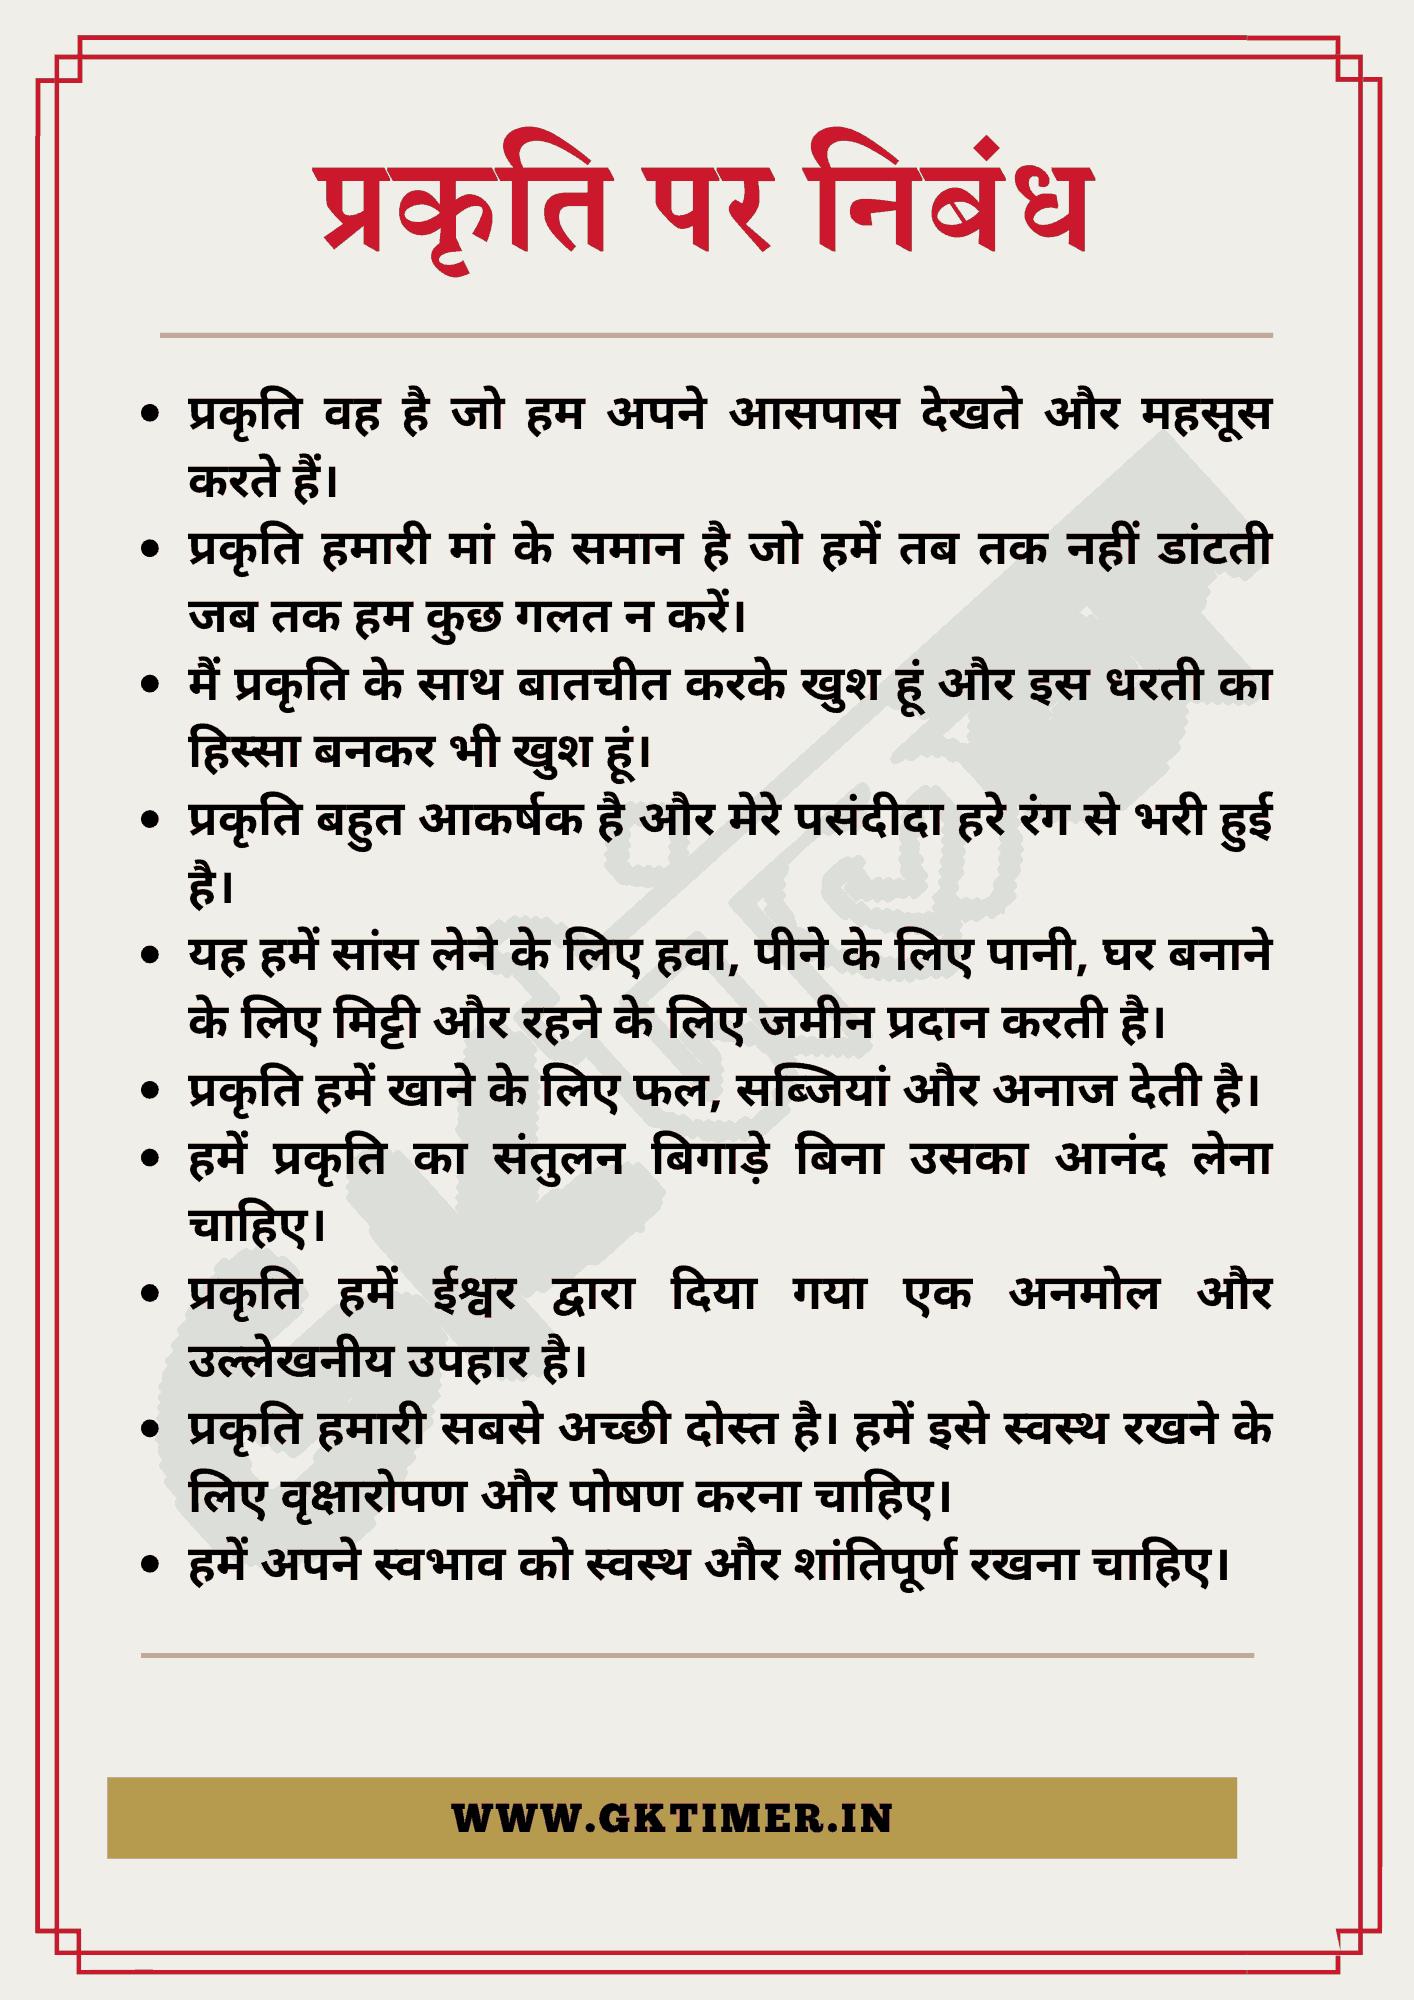 प्रकृति पर निबंध   Essay on Nature in Hindi   10 Lines on Nature in Hindi